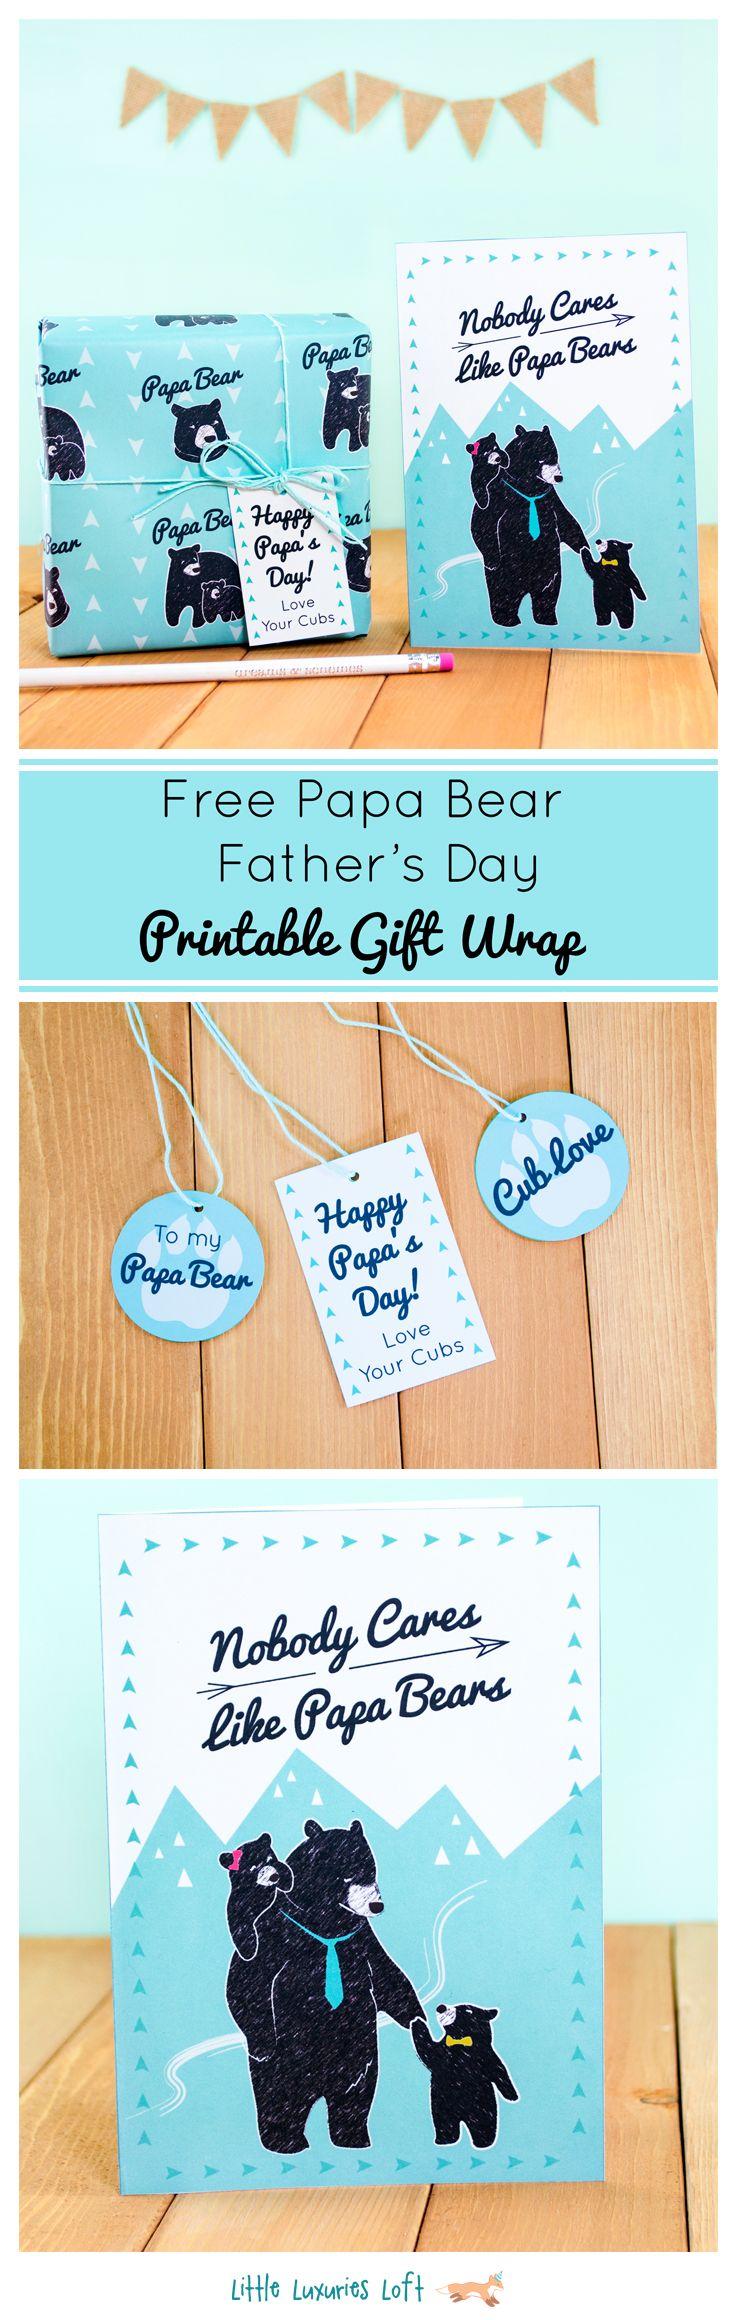 Nobody Cares Like Papa Bears! Print this cute gift wrap